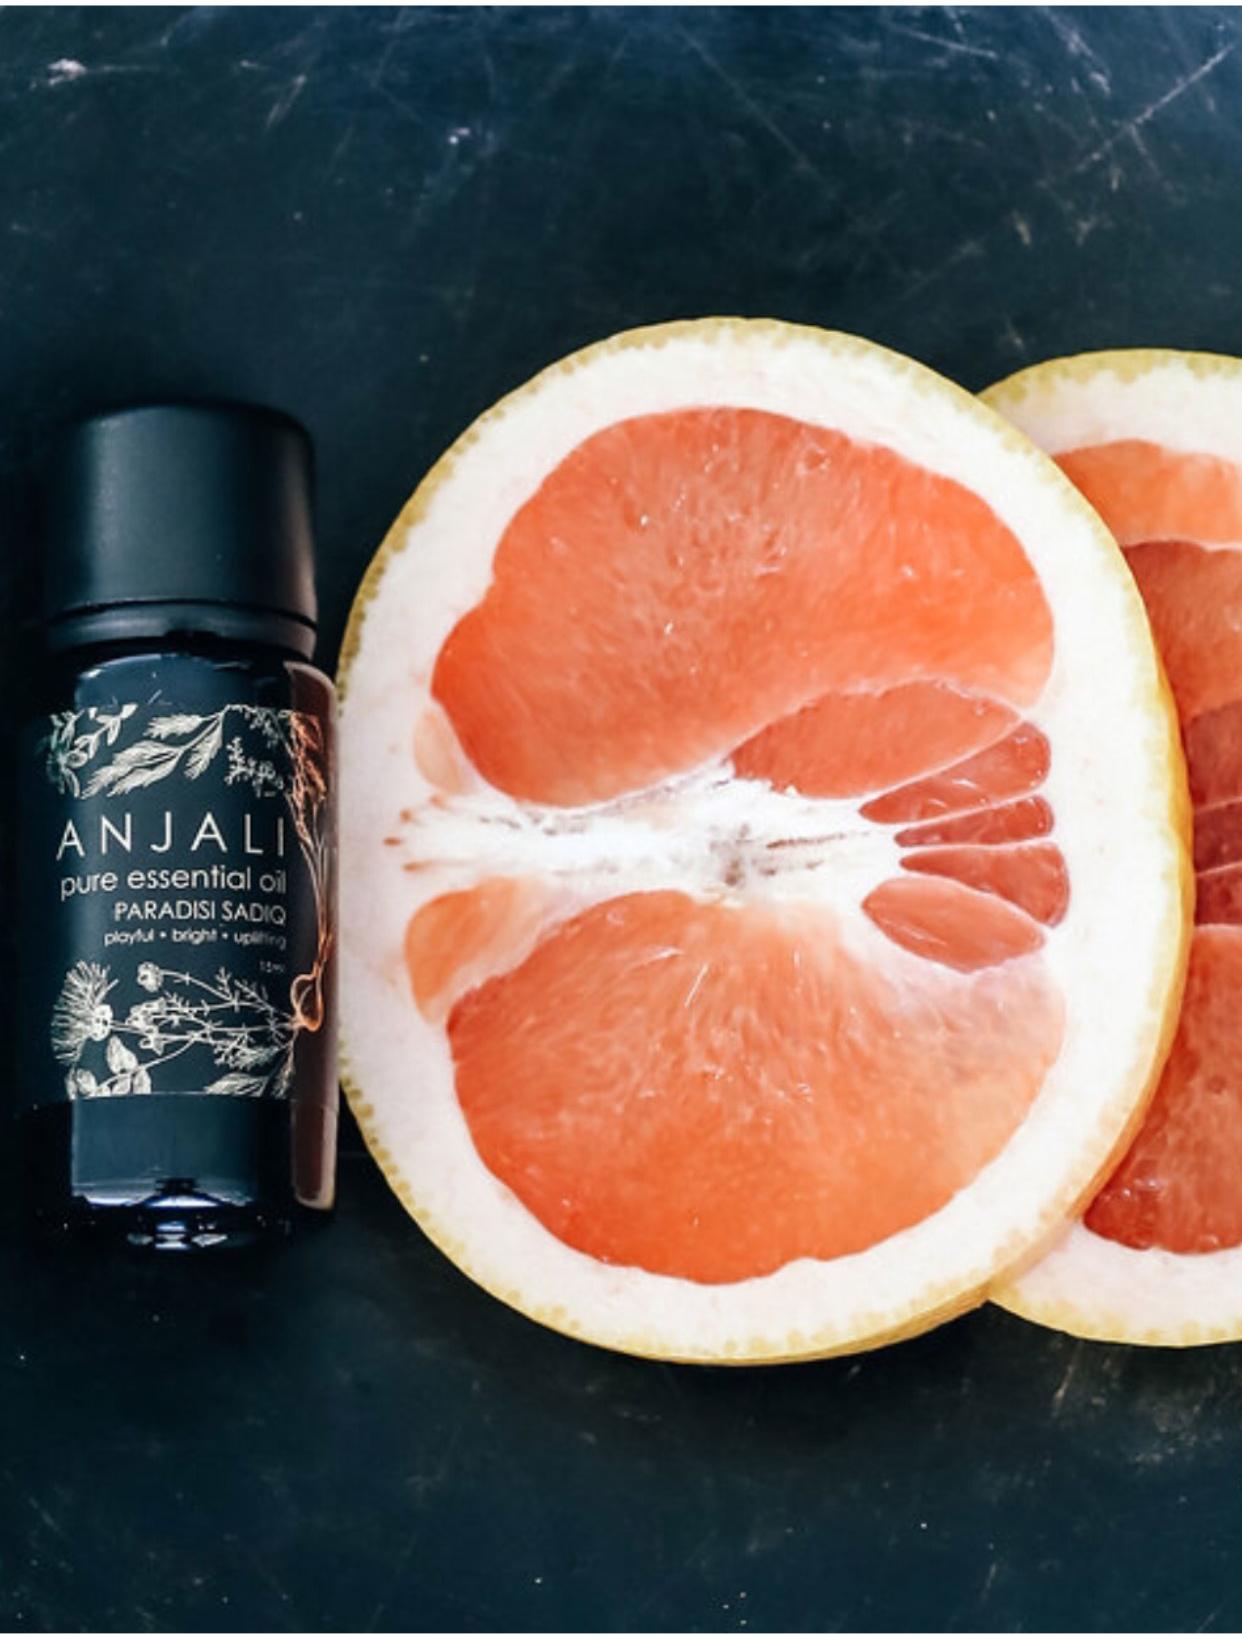 Charmaine Alamein - Anjali Essential Oils | @anjaliessentialoils